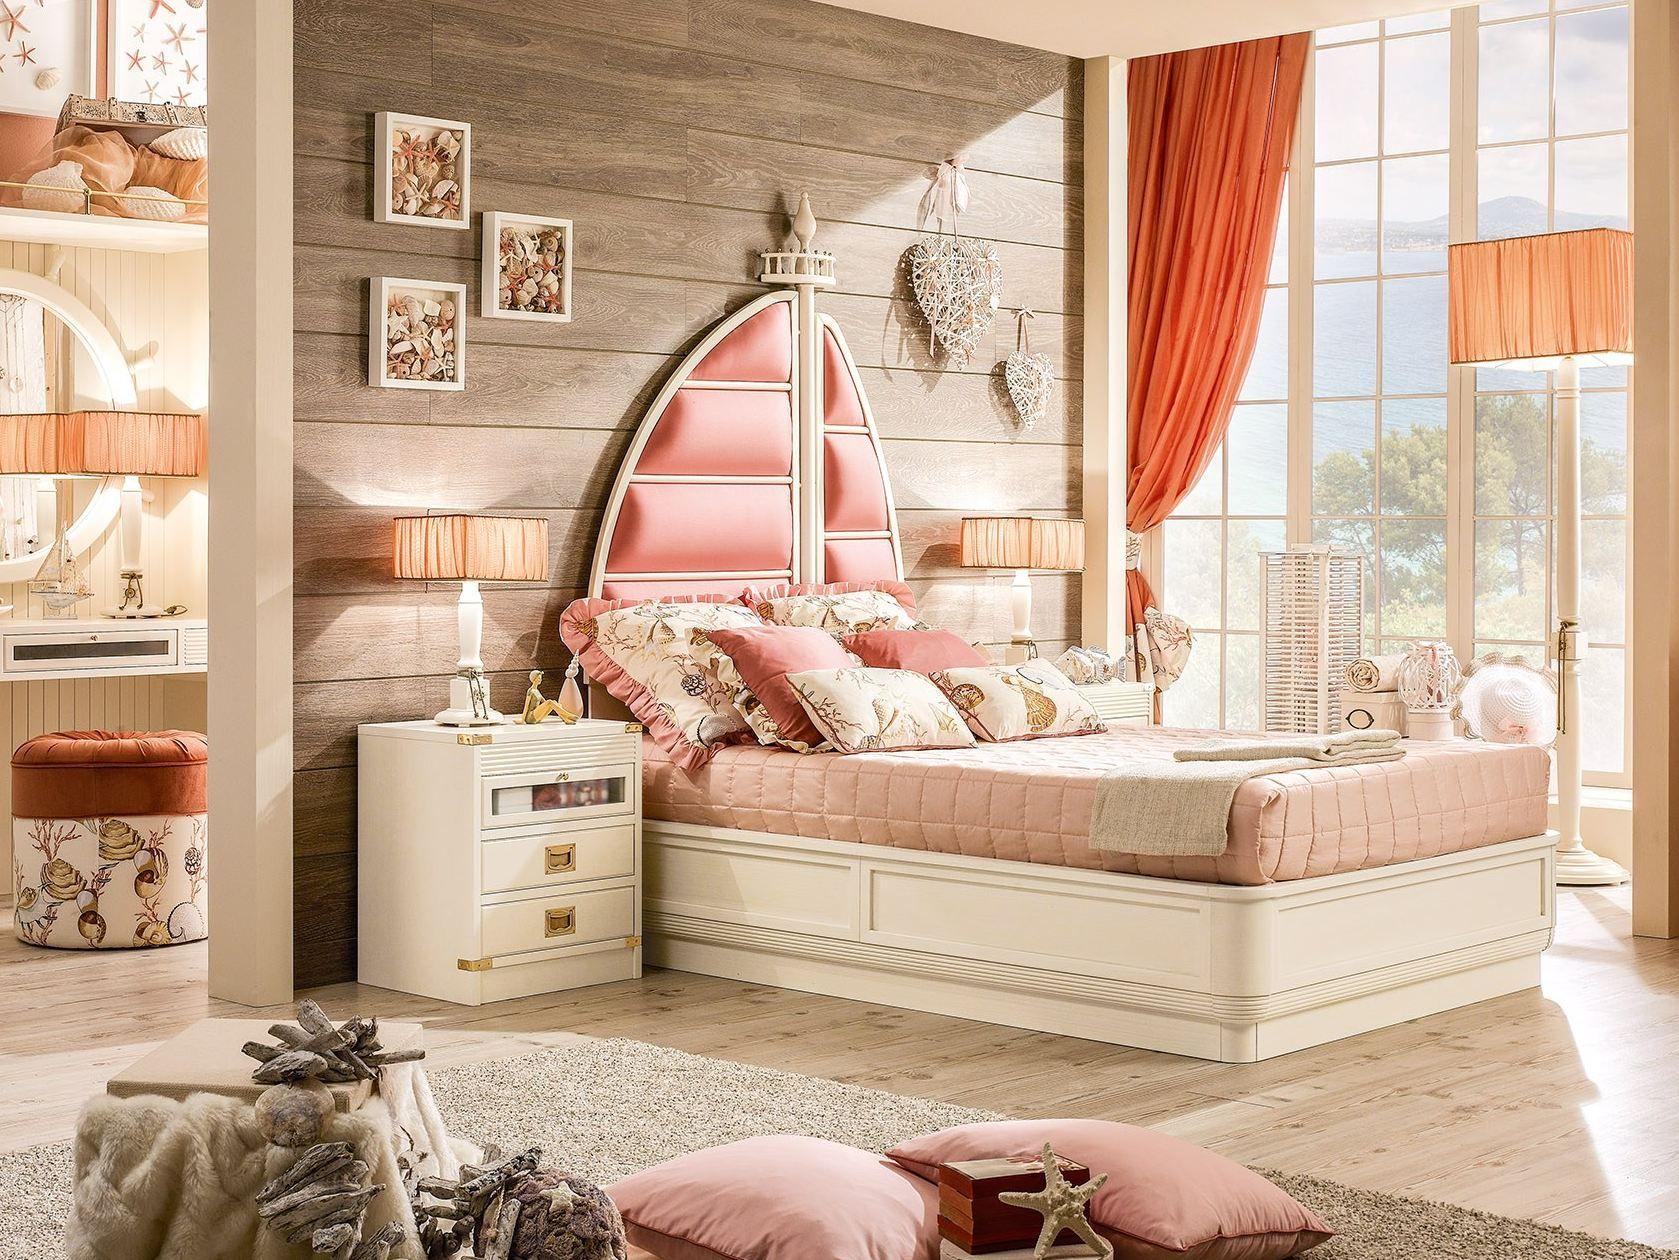 Ariel cama contenedor by caroti - Spalliera letto imbottita ...